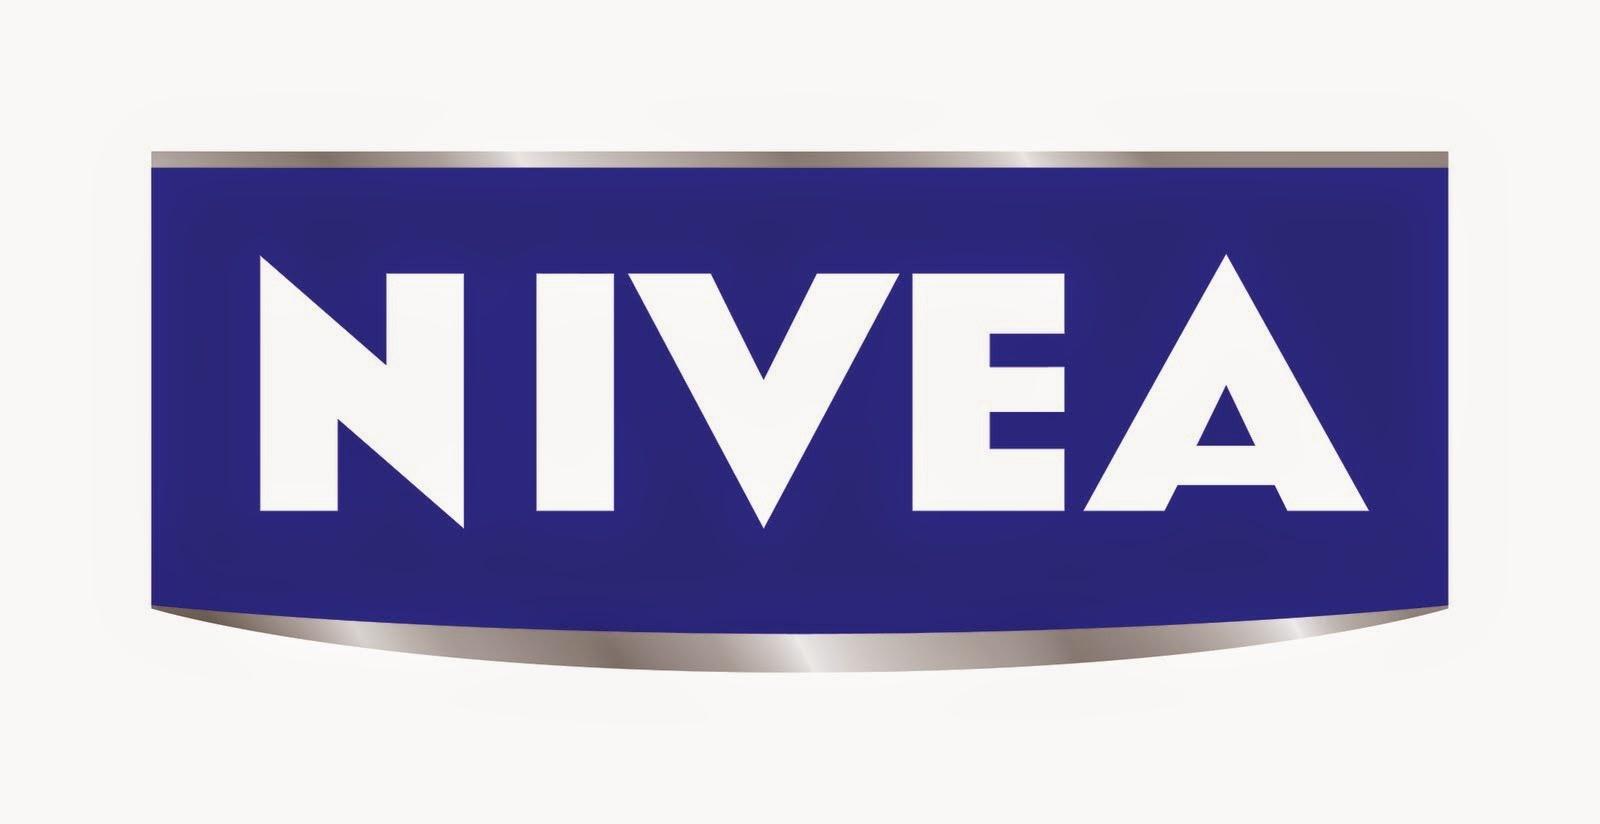 http://www.nivea.pl/